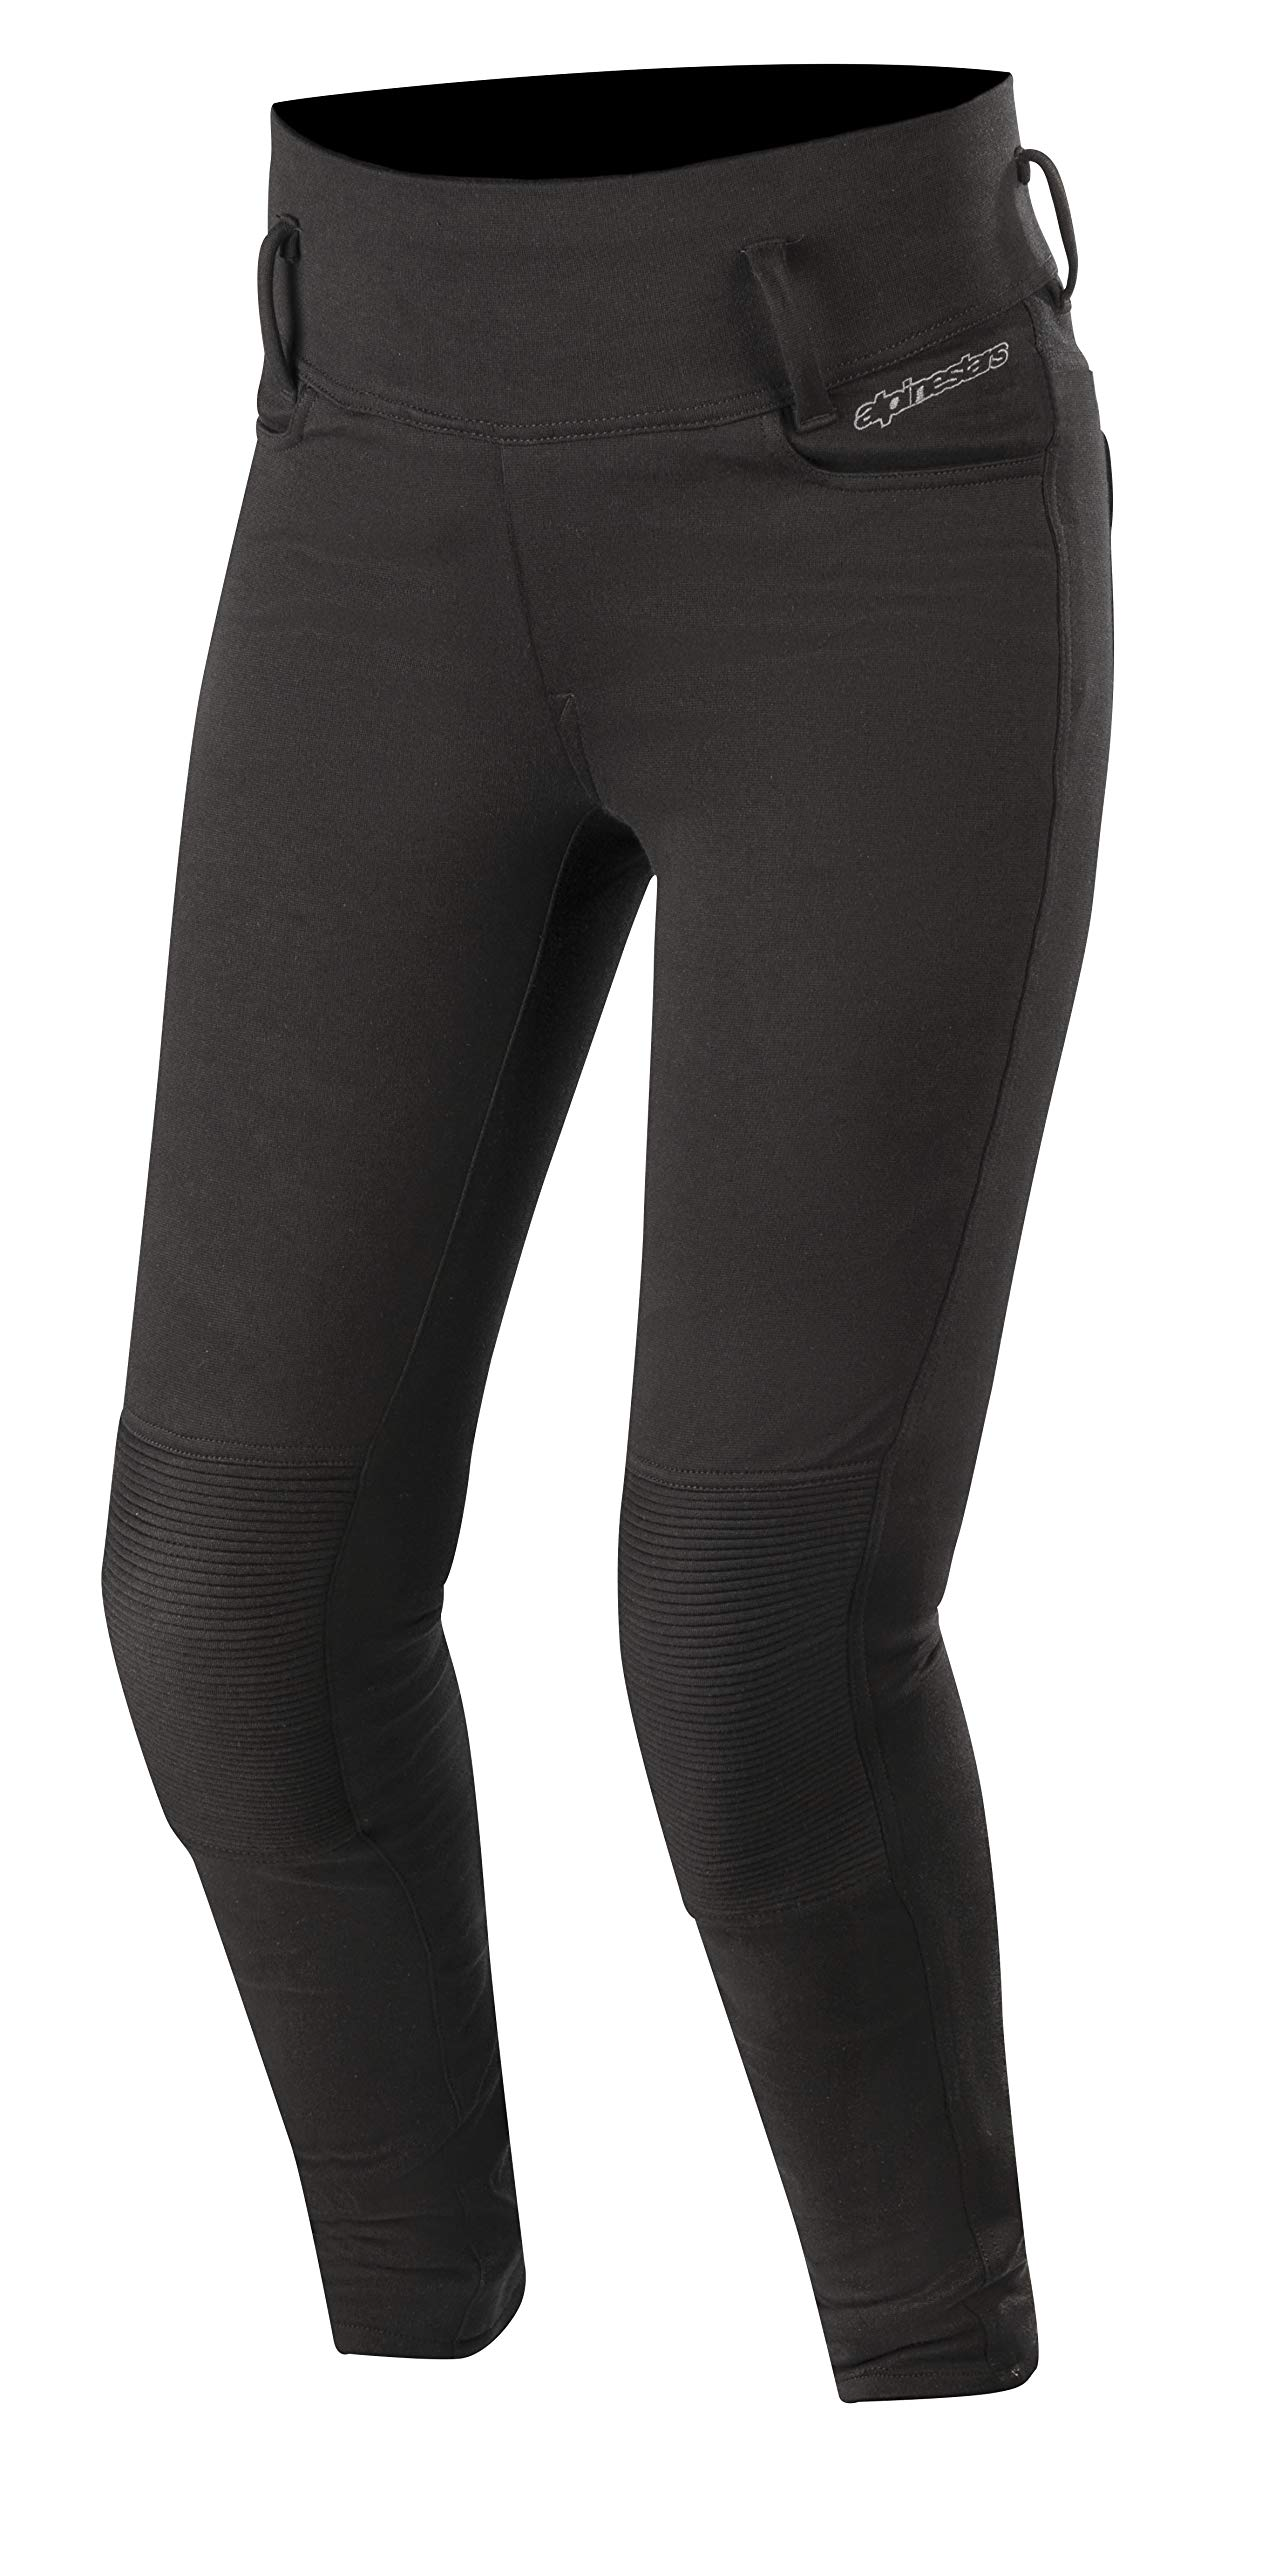 Banshee Women's Protective Motorcycle Leggings (Medium, Black)